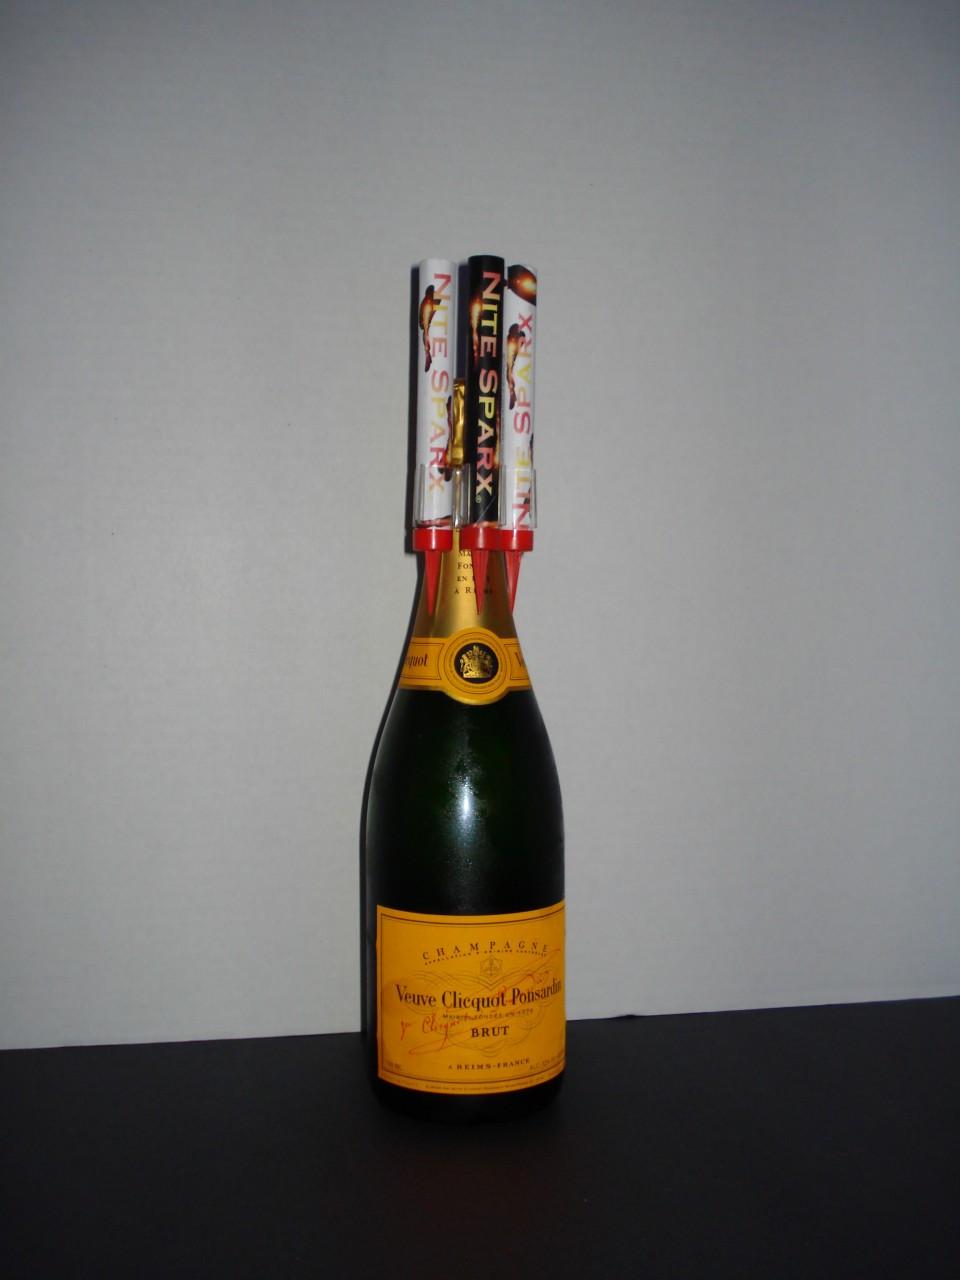 TRIPLE BOTTLE, sparkler clips, nite, sparx, big birthday candles, champagne bottle sparklers, bottle service, fireworks, club, birthday, party, celebration, lounge, bar, gold, wire, sparkler, candle, firework, fire, party, club, drinks, celebration, wedding, champagne, poppers, party, celebration, new, years, event, custom champagne bottle sparklers, cake sparklers, wedding sparklers, wedding firework displays, wedding fireworks display, celebration candle, wedding firework display, indoor sparklers, fireworks wedding, sparkler bombs, wedding fireworks, party cannons, confetti cannon rental, cake sparklers, fireworks stores in dallas, fireworks stores las vegas, firework stores in las vegas, extra large sparklers, vip bar supplies, buy champagne bottles, bridal supplies, wedding fireworks, wedding decorations, sparklers in bulk, sparklers, nite, sparx, big birthday candles, champagne bottle sparklers, bottle service, fireworks, club, birthday, party, celebration, lounge, bar